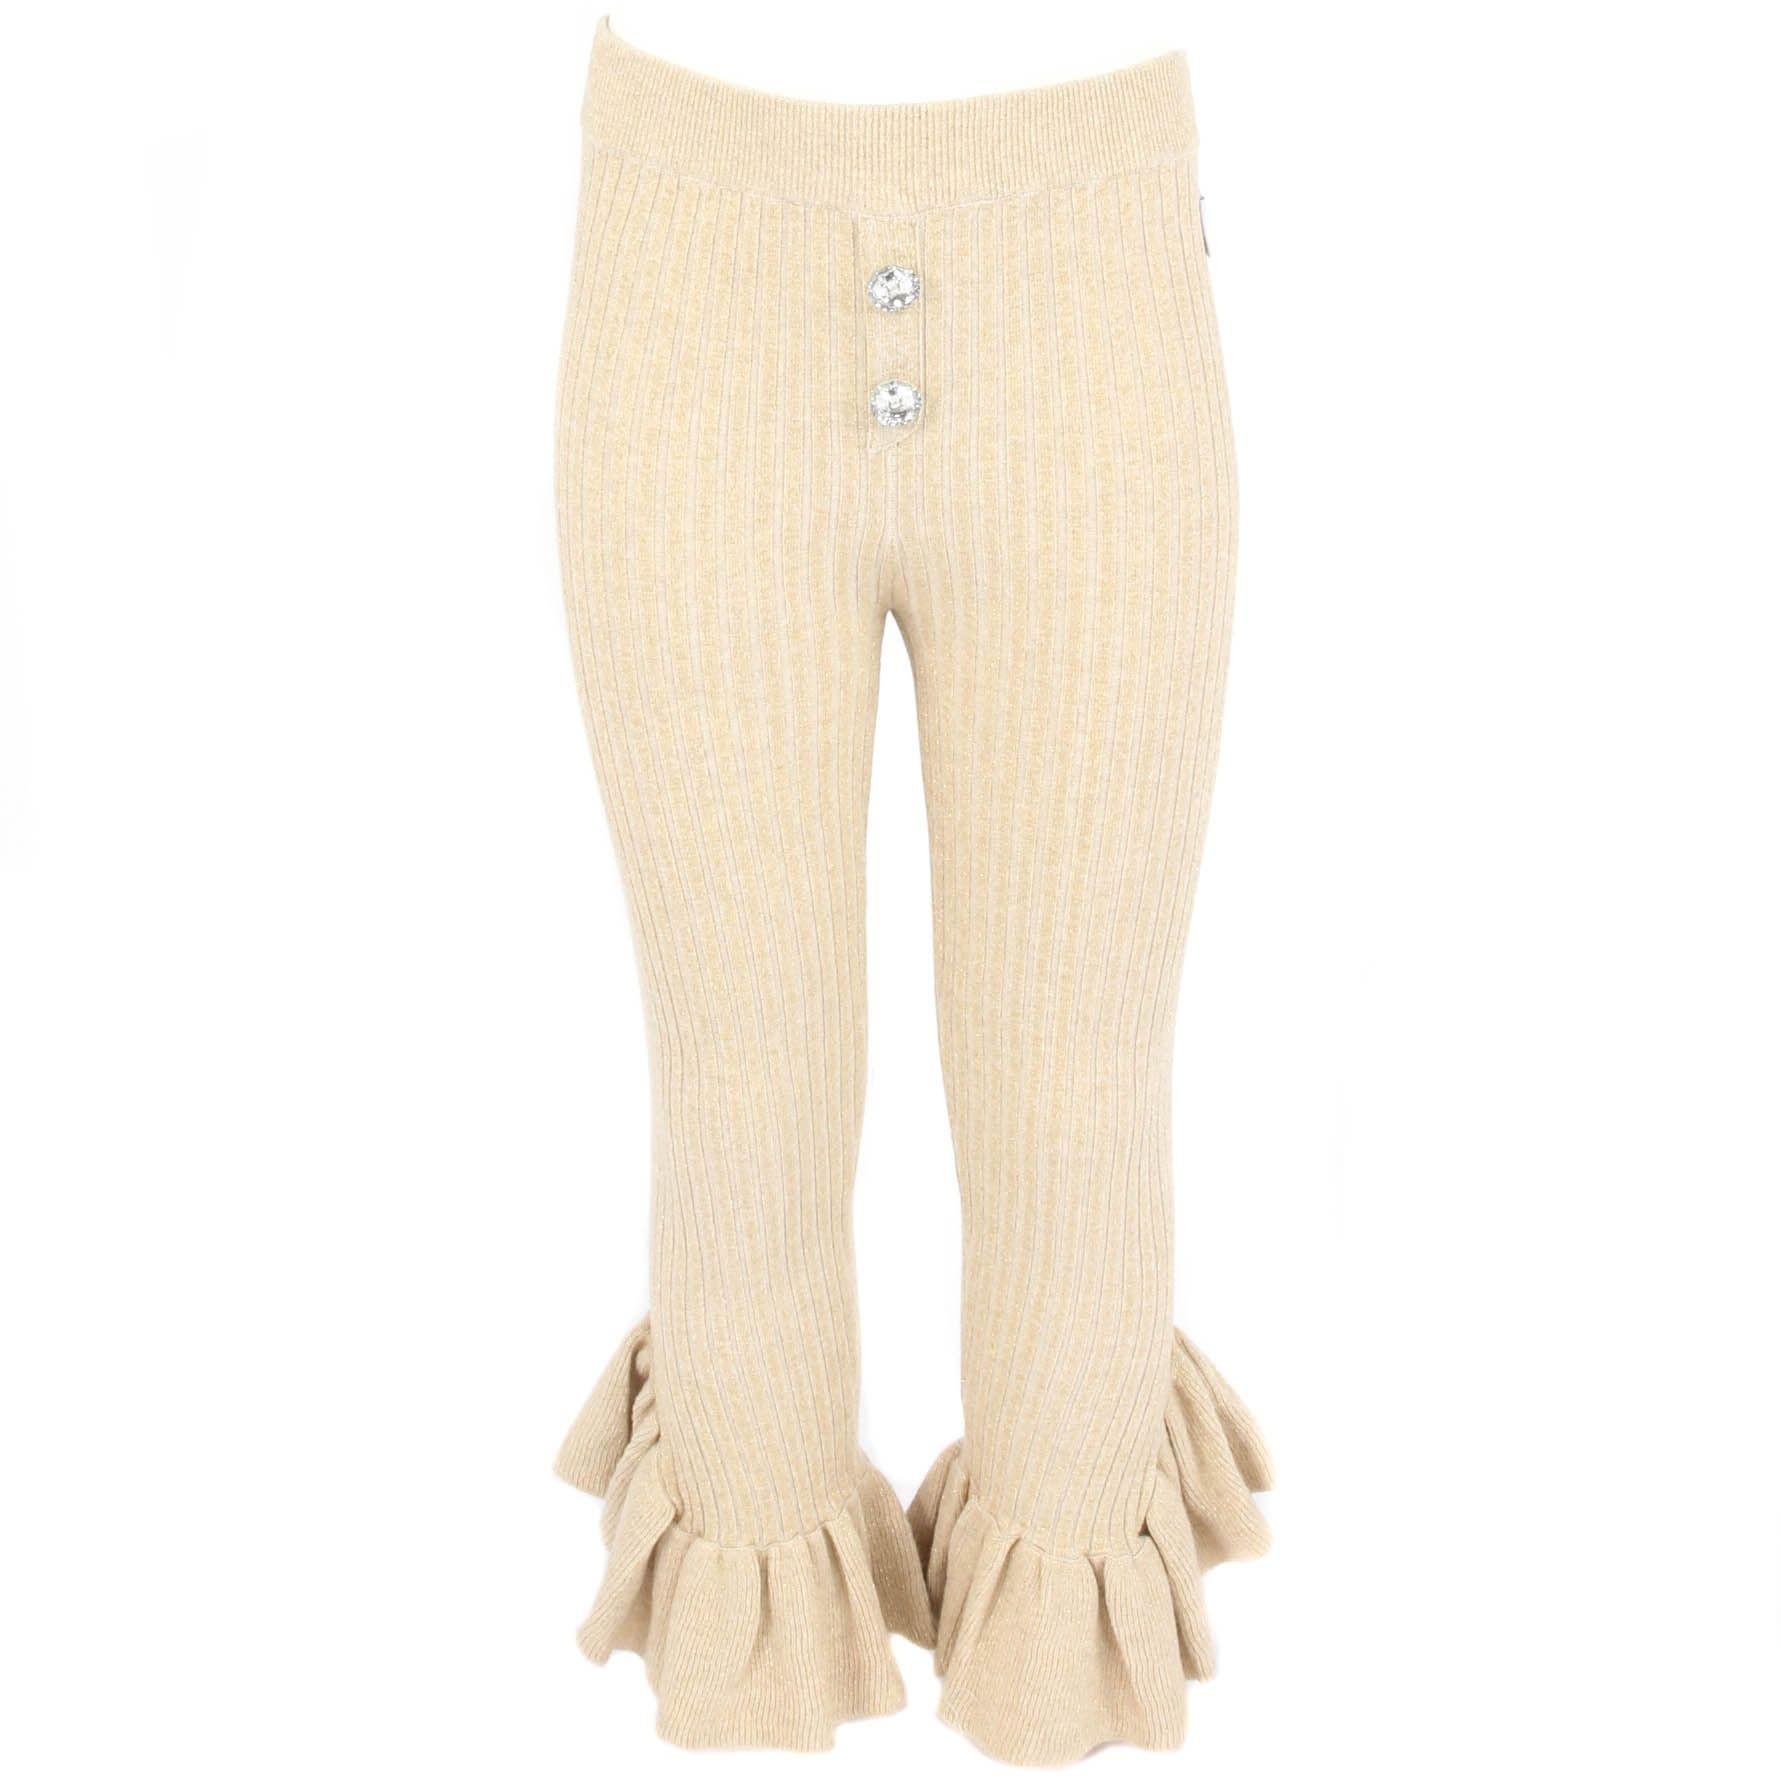 Afbeelding van Reinders Diamond pants lurex wit